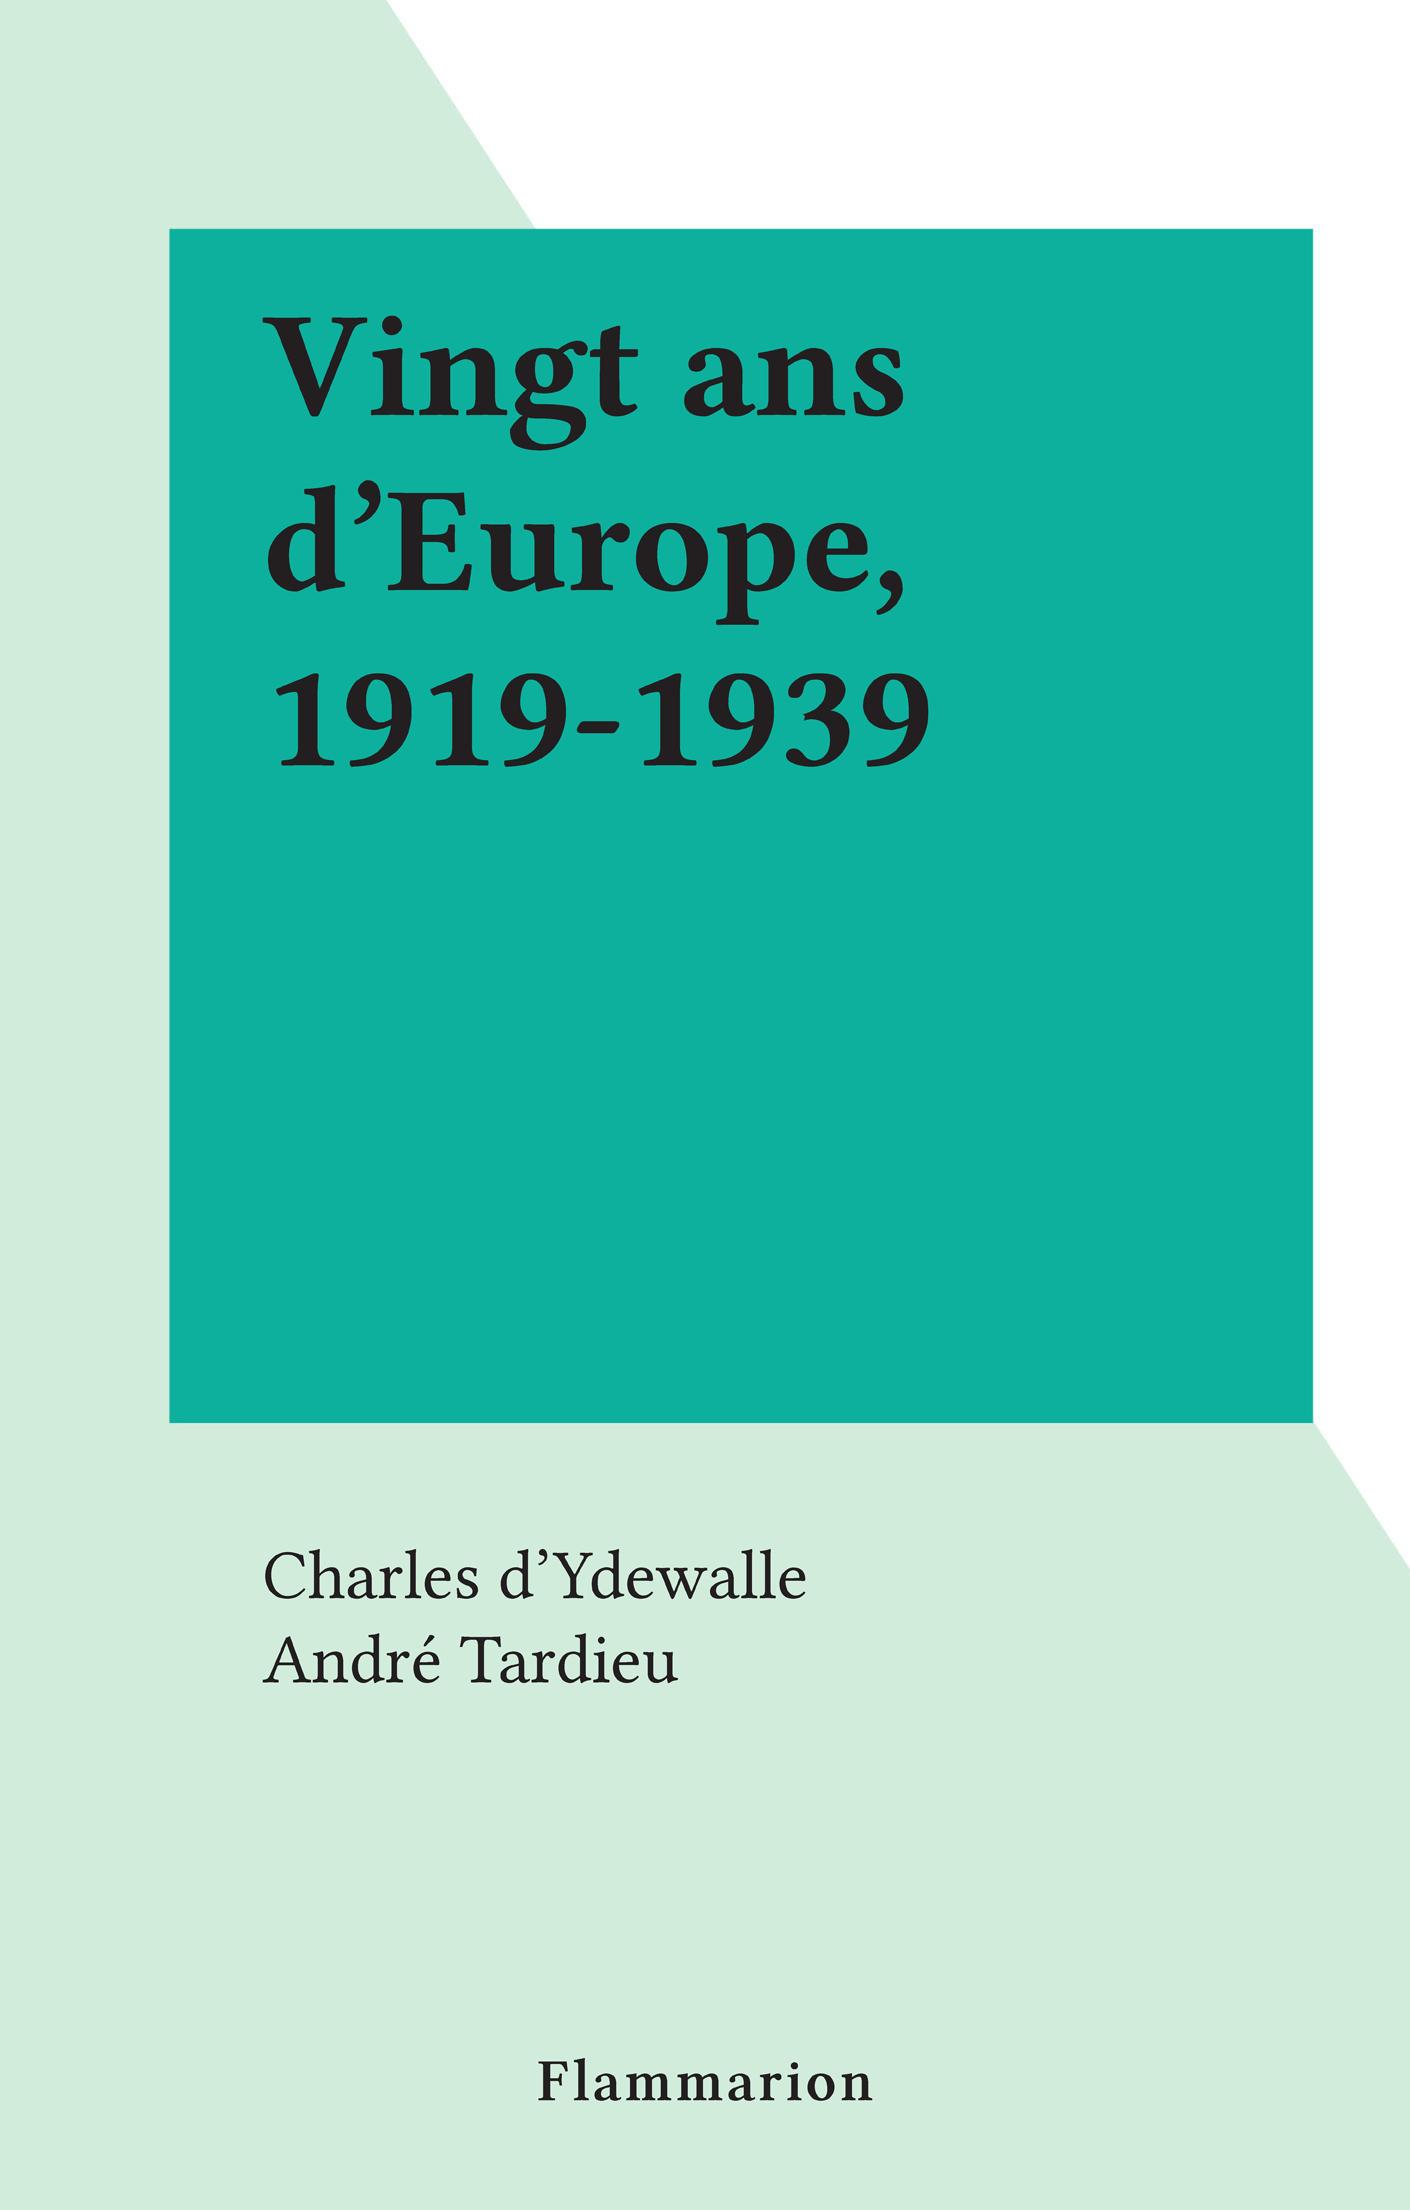 Vingt ans d'Europe, 1919-1939